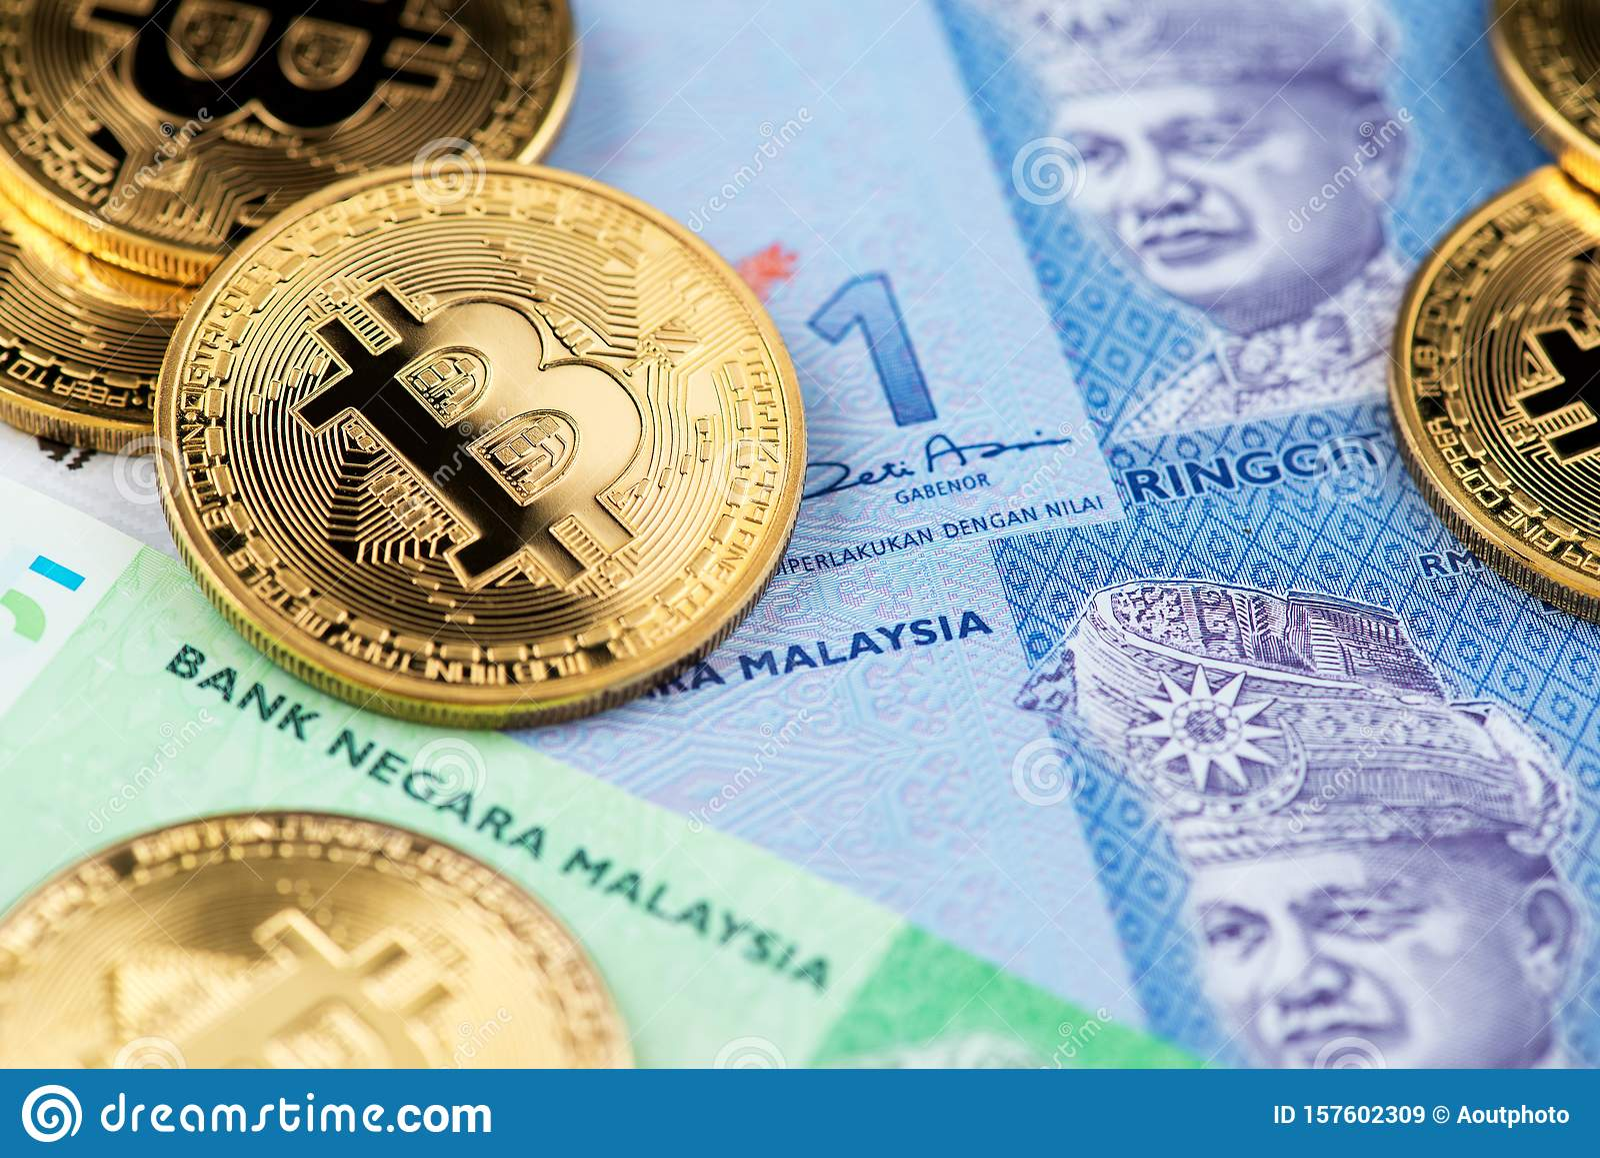 ringgit bitcoin)